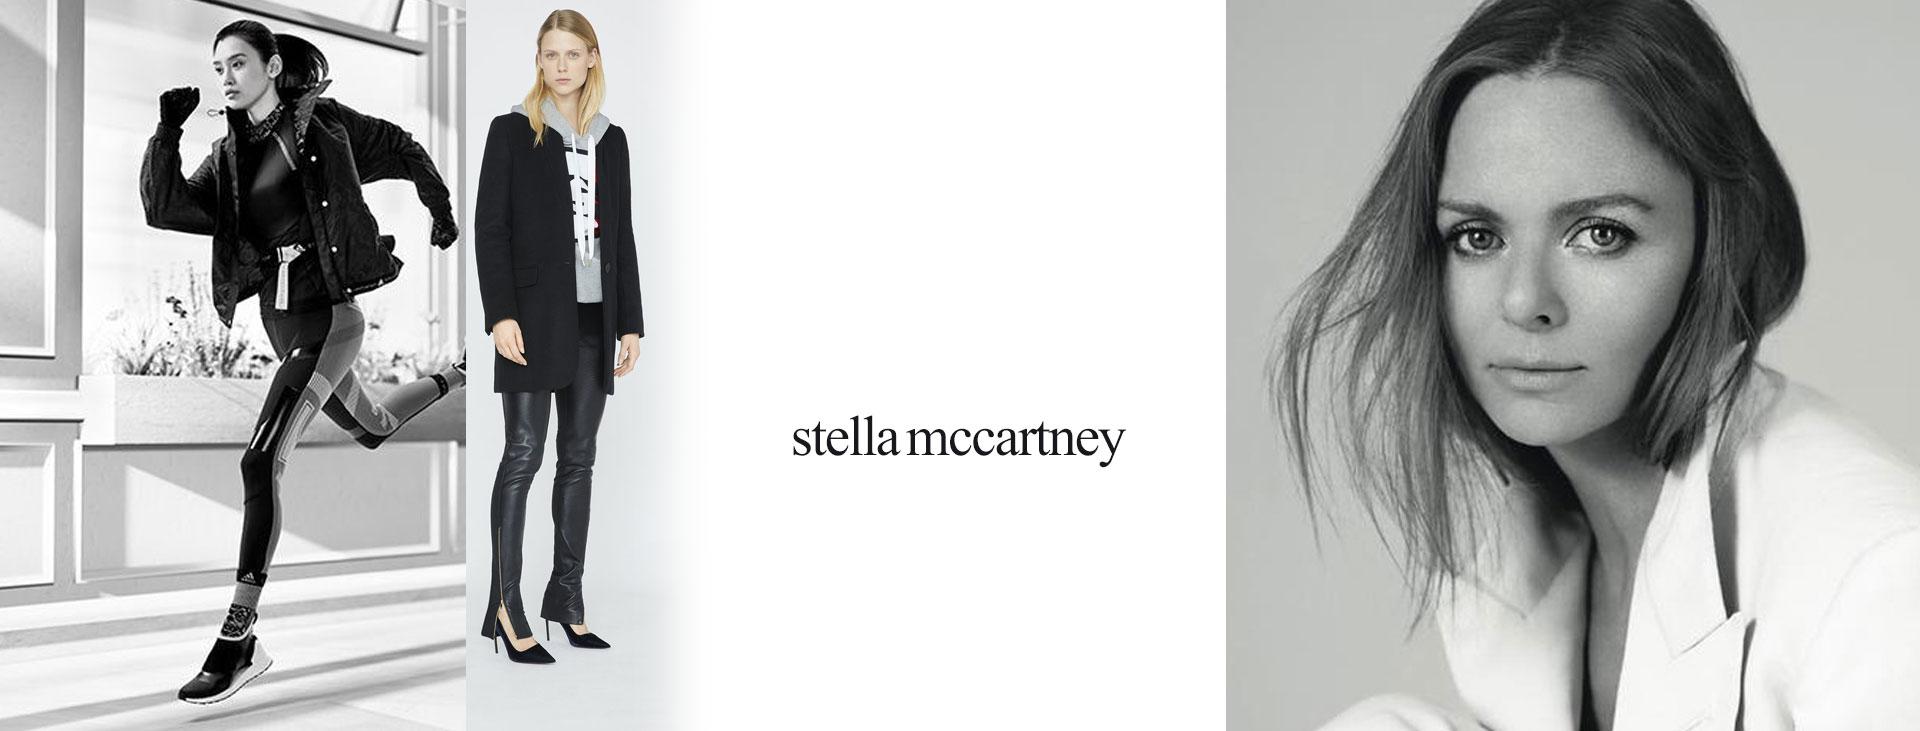 stella mccartney - زنان پیشگام در صنعت مد